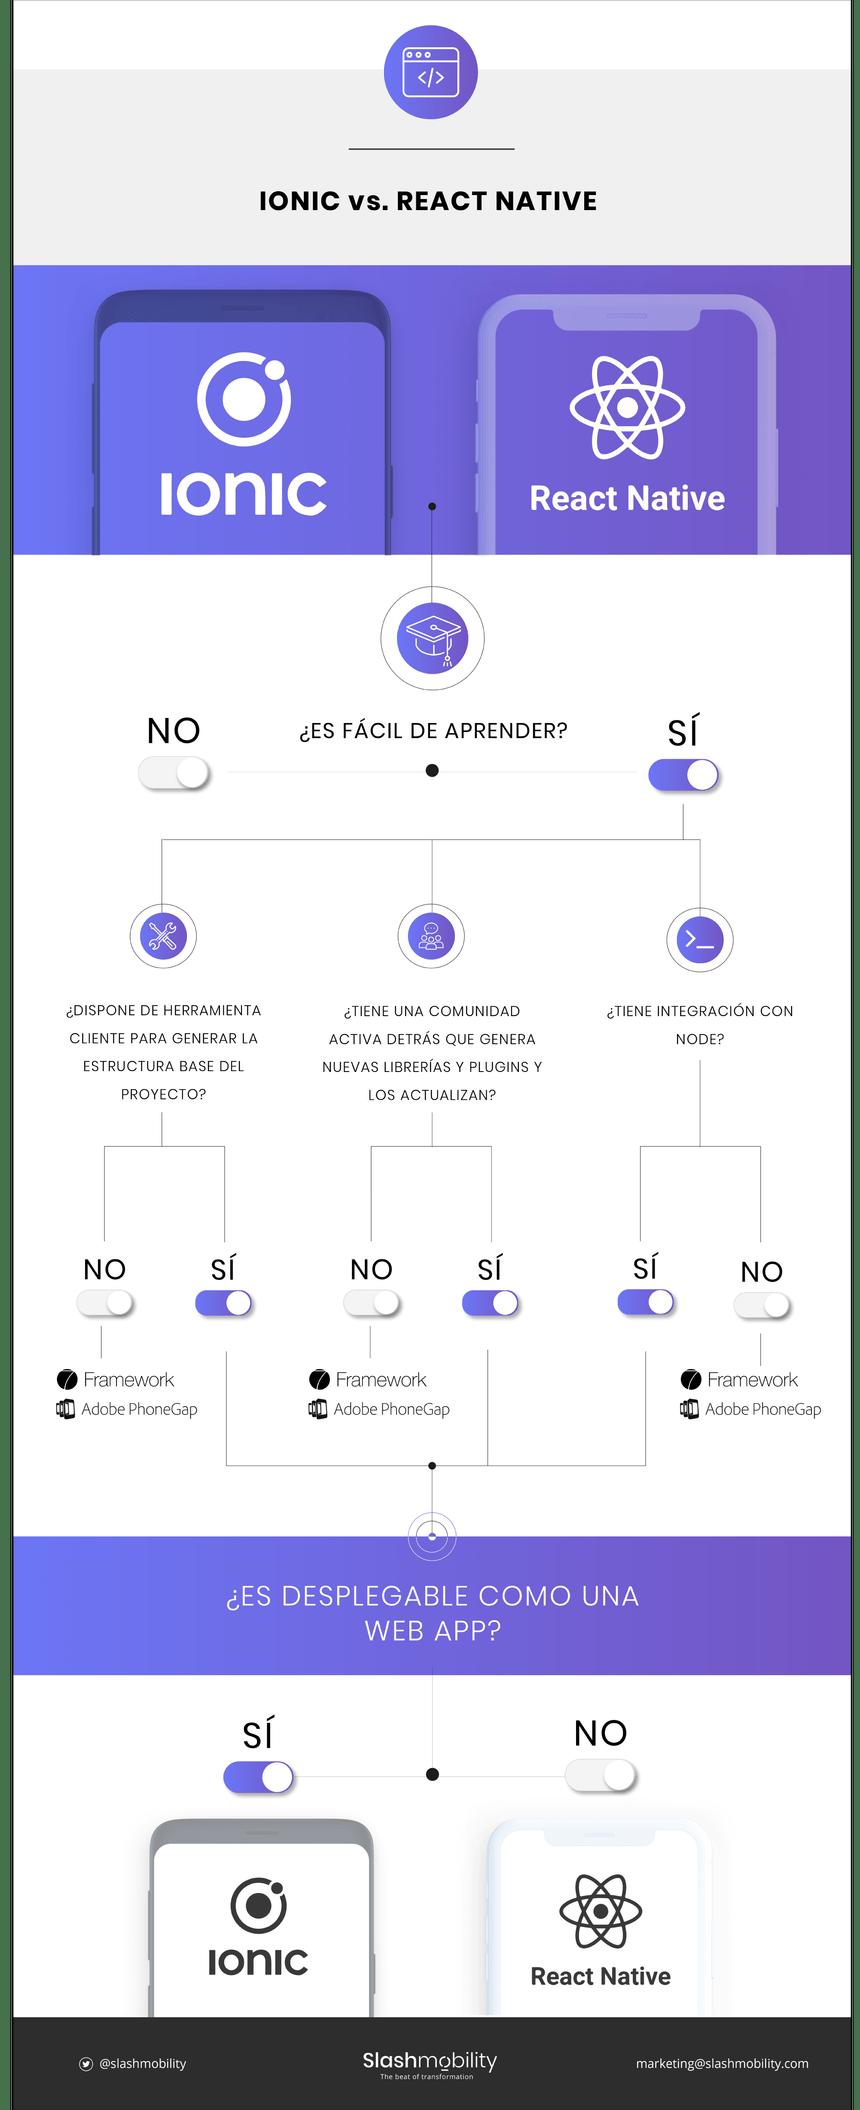 Ionic vs React Native #infografia #framework #software